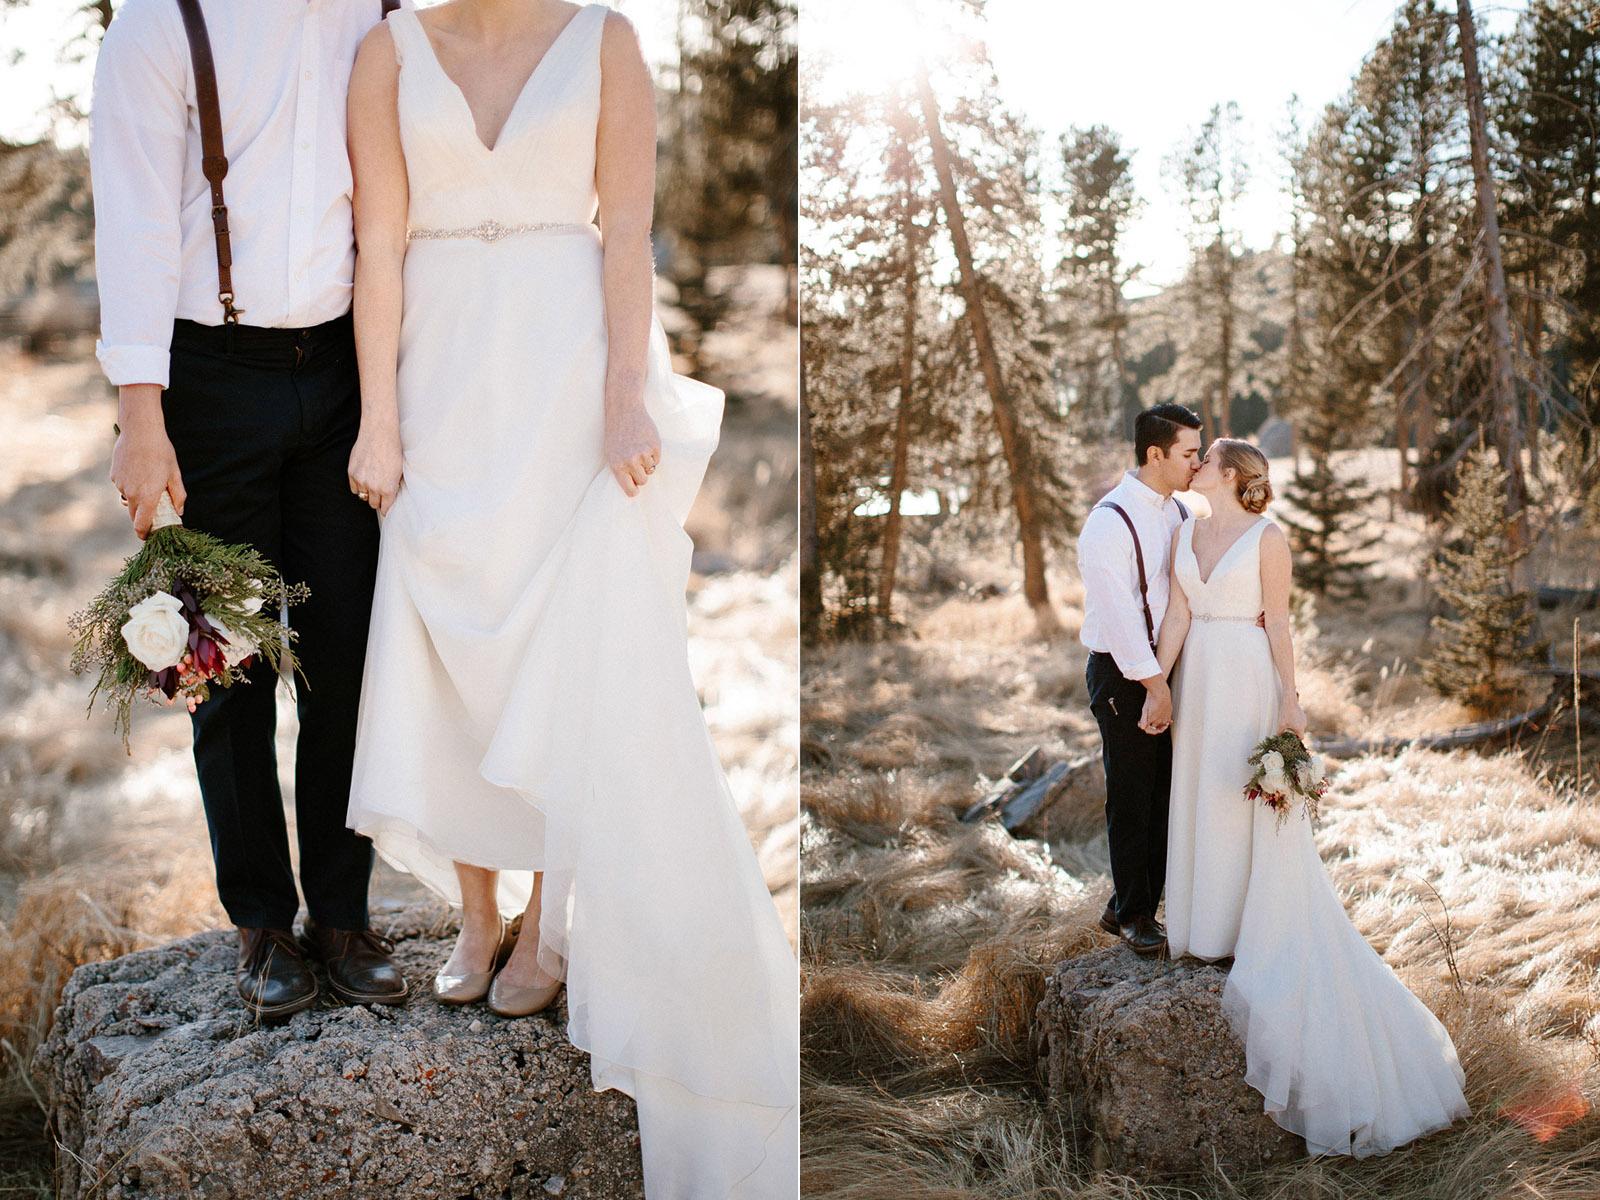 sioux-falls-black-hills-rapid-city-elopement-wedding-adventure-photographer-custer-sylvan-lake-20.jpg